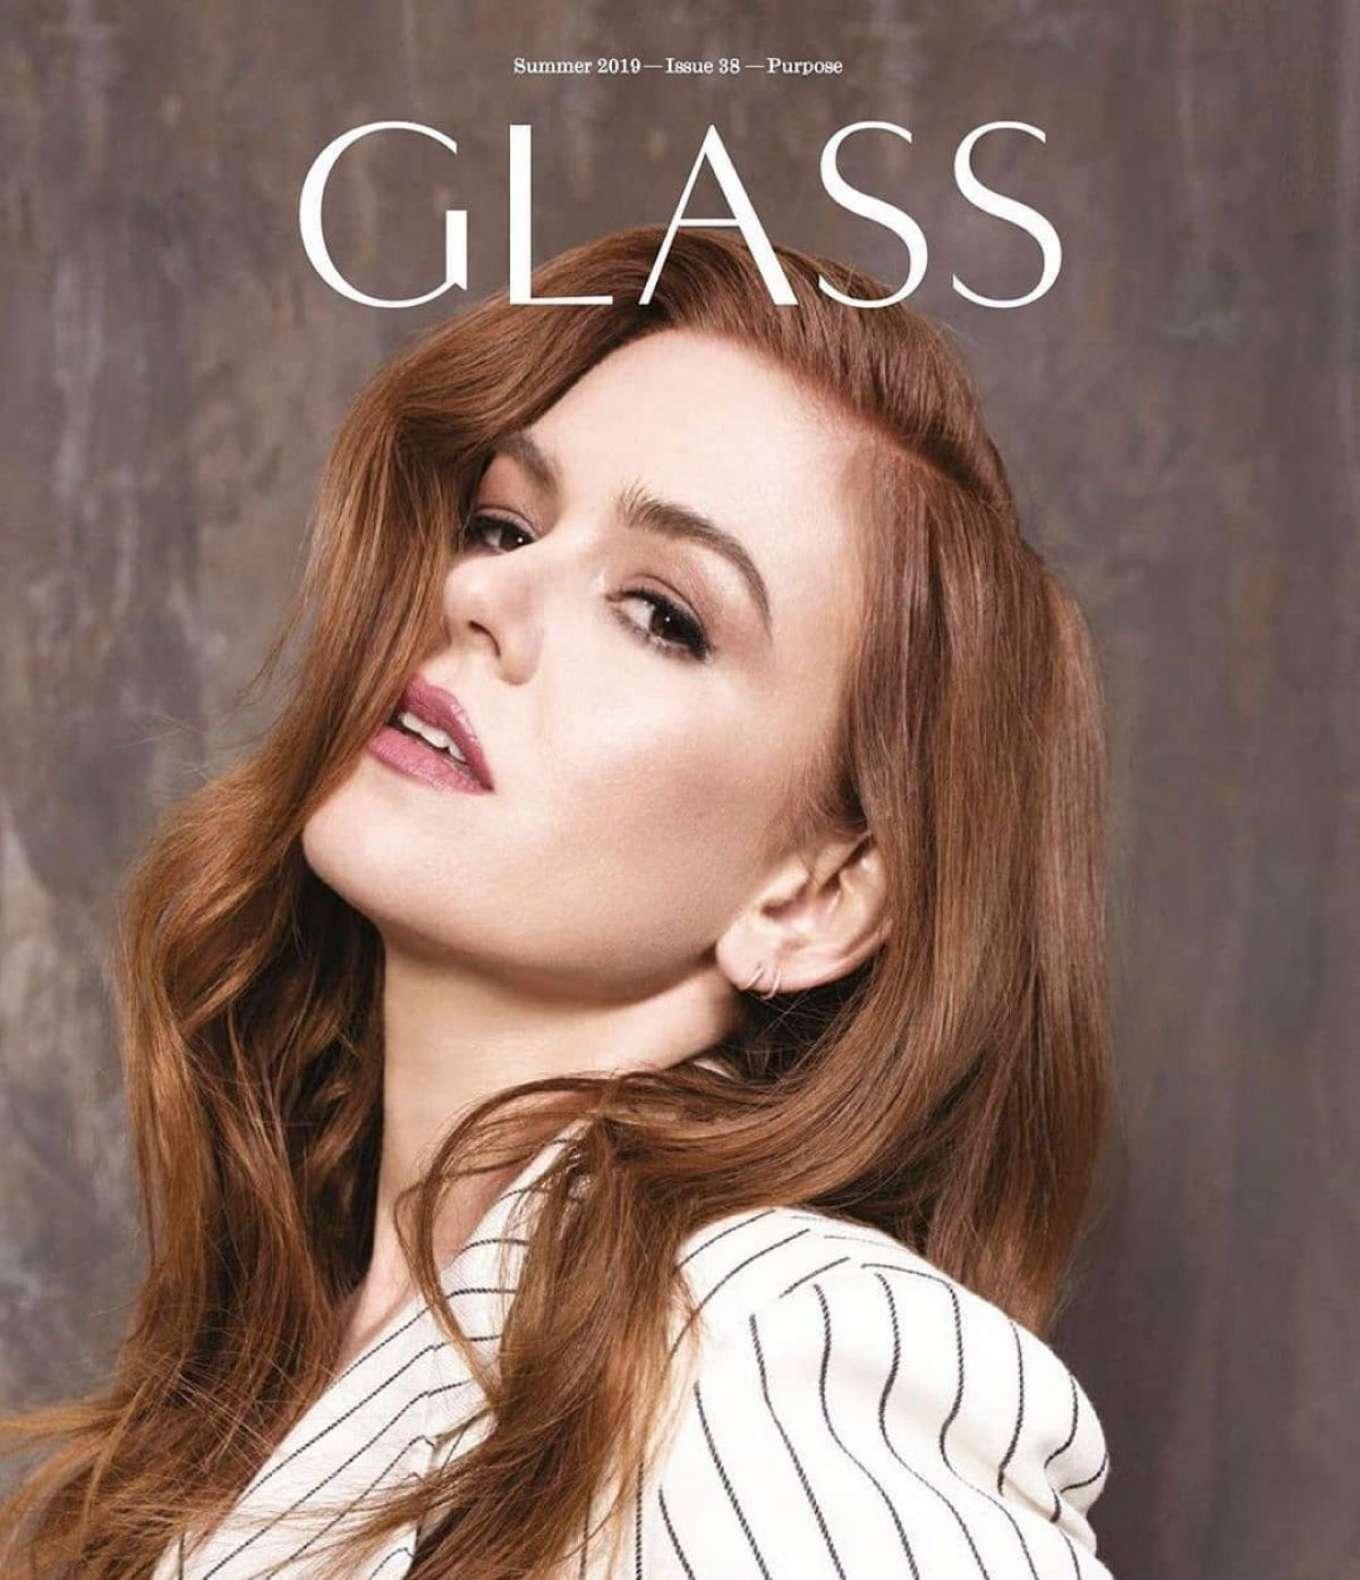 Isla Fisher 2019 : Isla Fisher: Glass Magazine (Summer 2019)-05